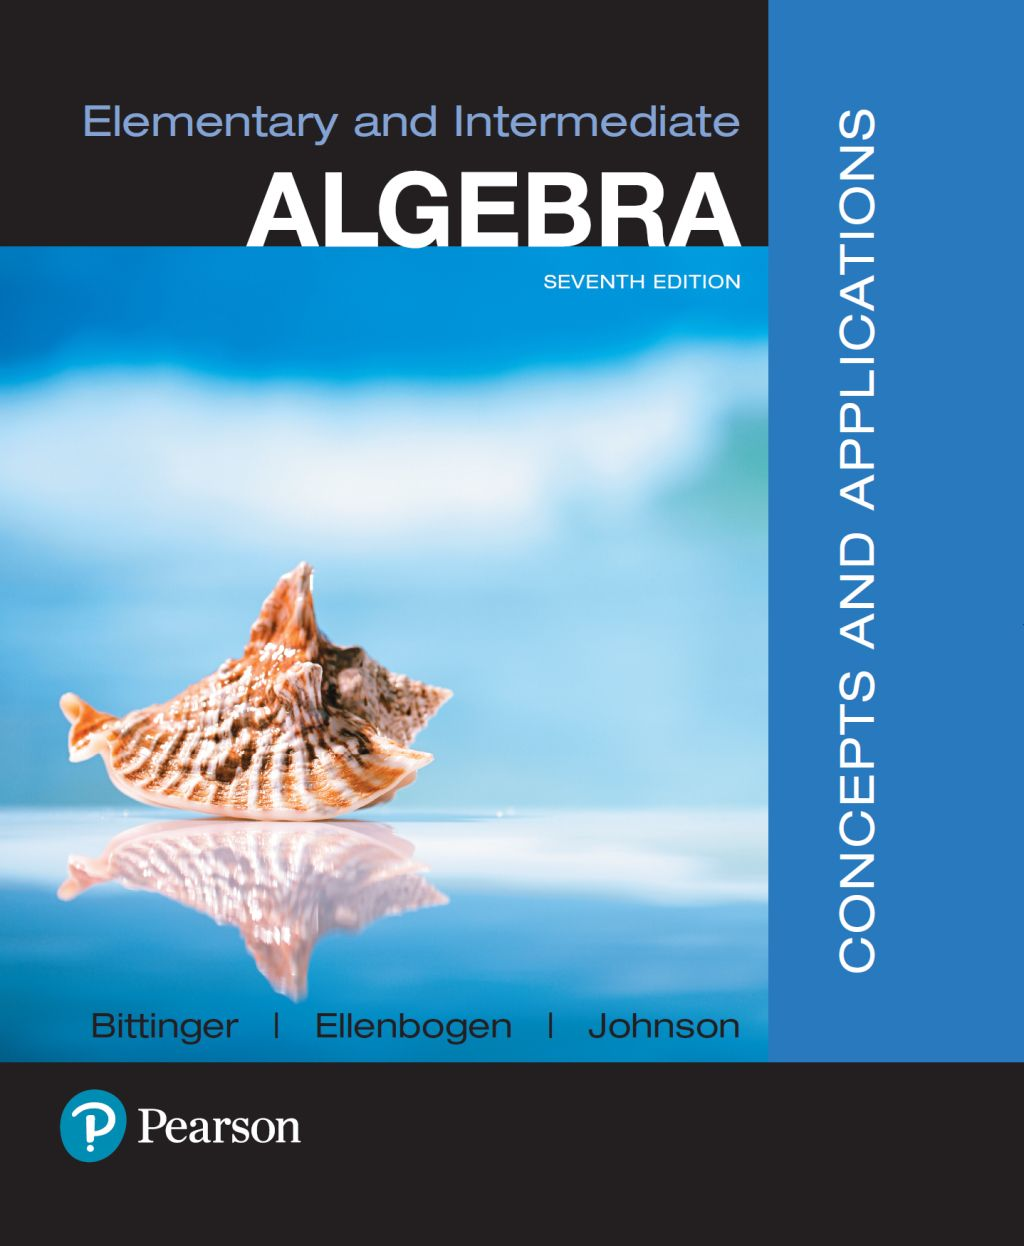 Elementary And Intermediate Algebra Ebook Rental